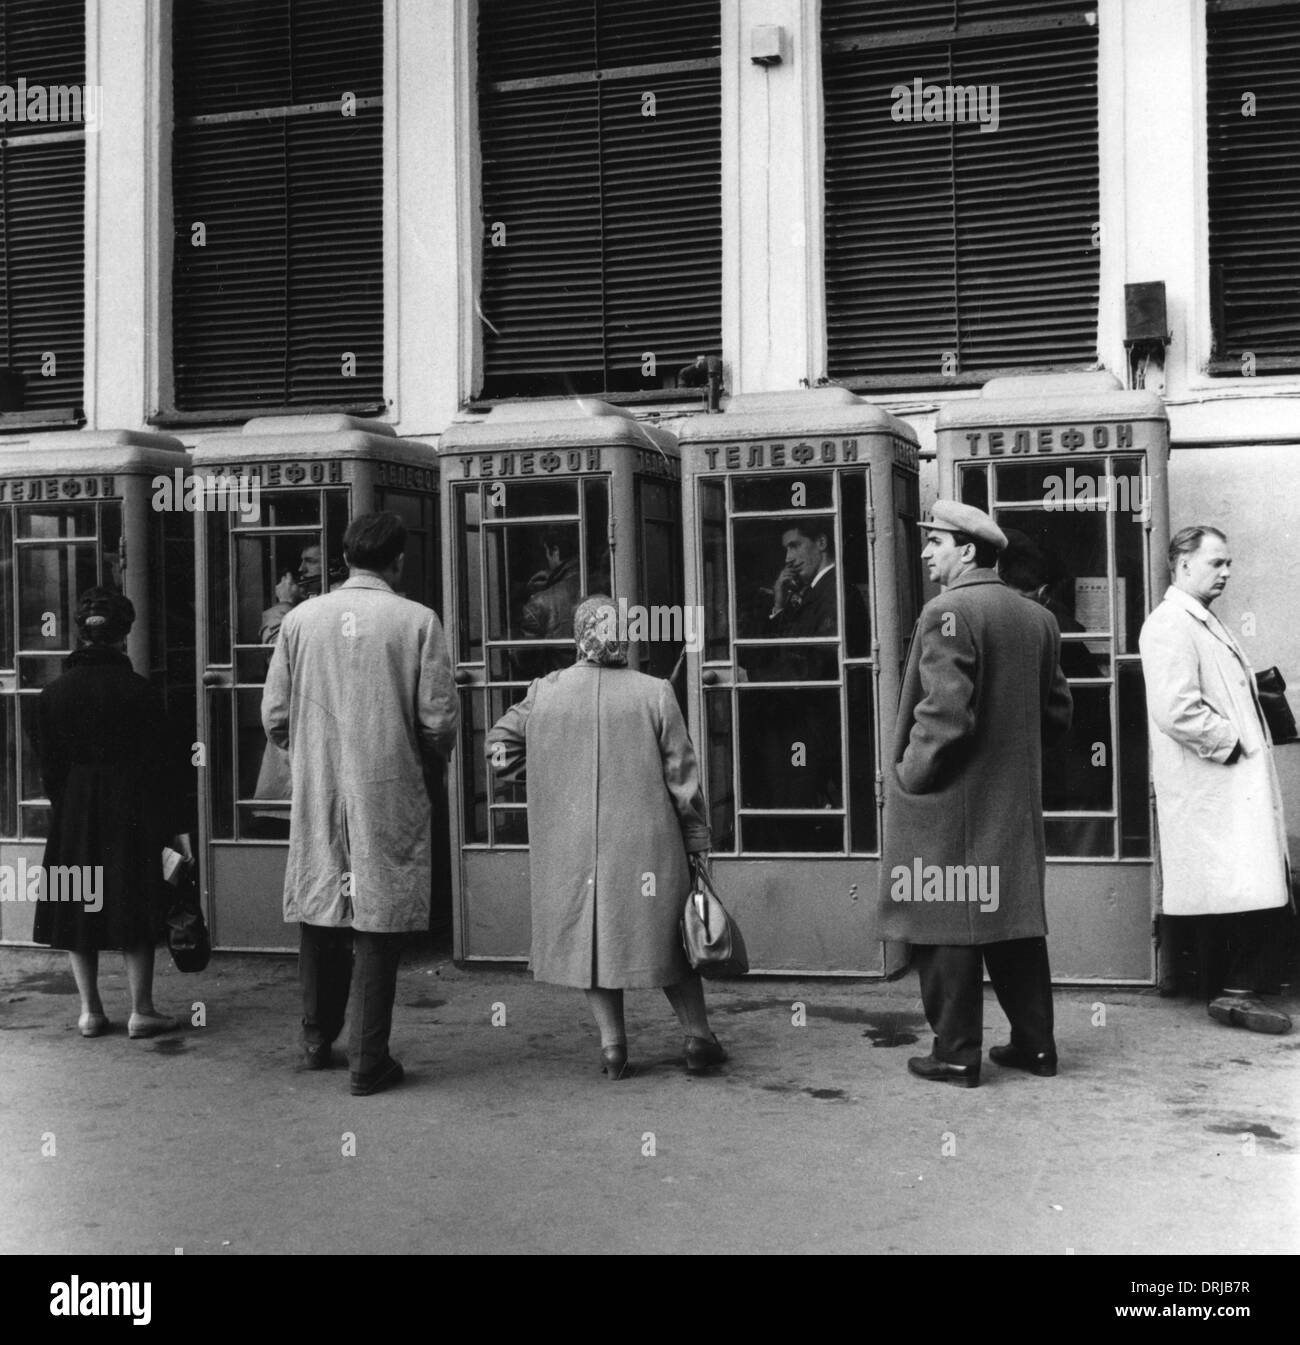 Telephone kiosks, Moscow, Russia - Stock Image